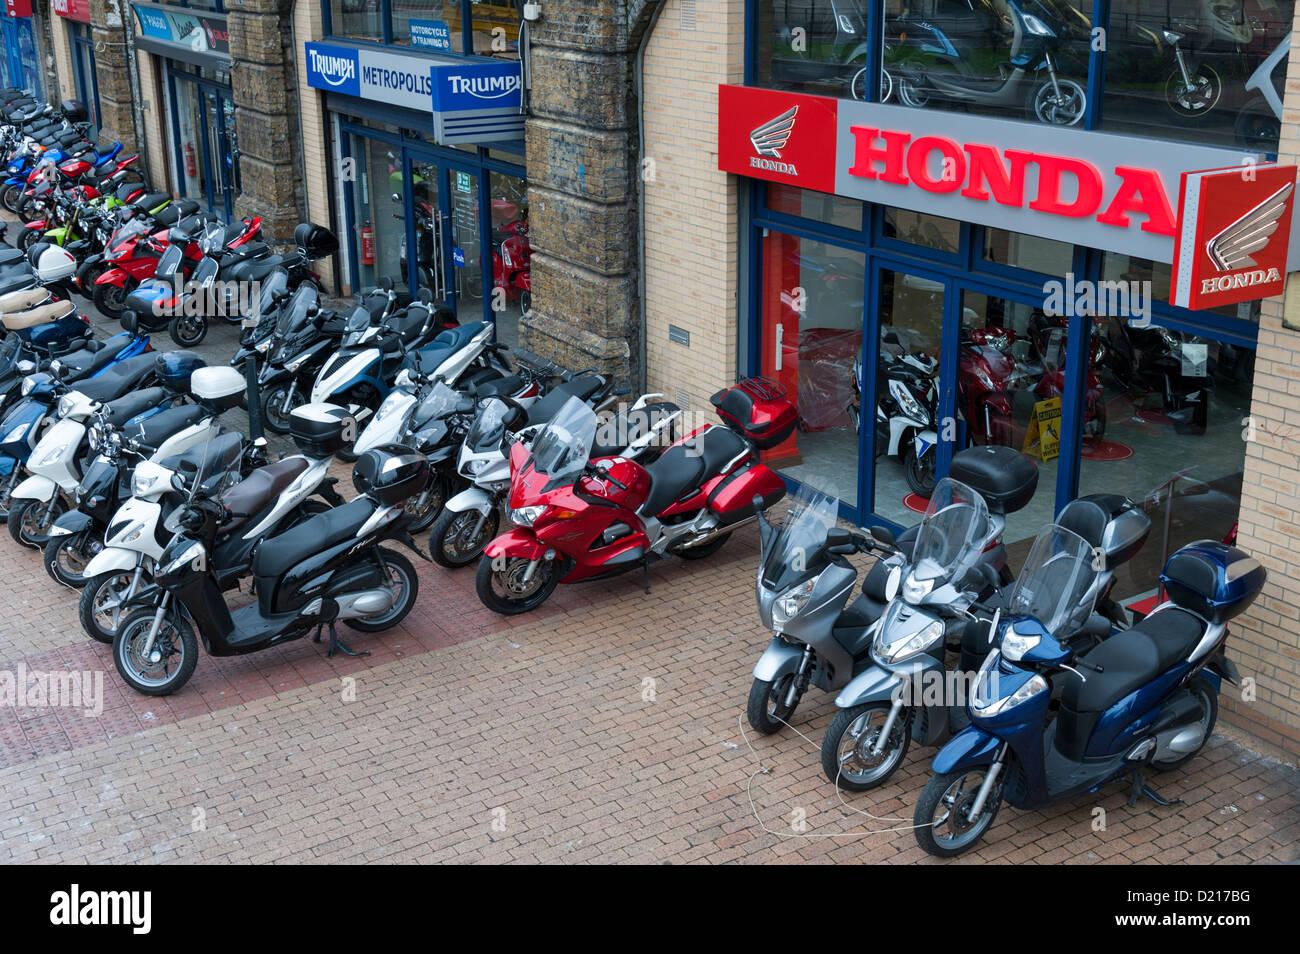 Honda Motorcycle Dealer Shop At Vauxhall London UK With